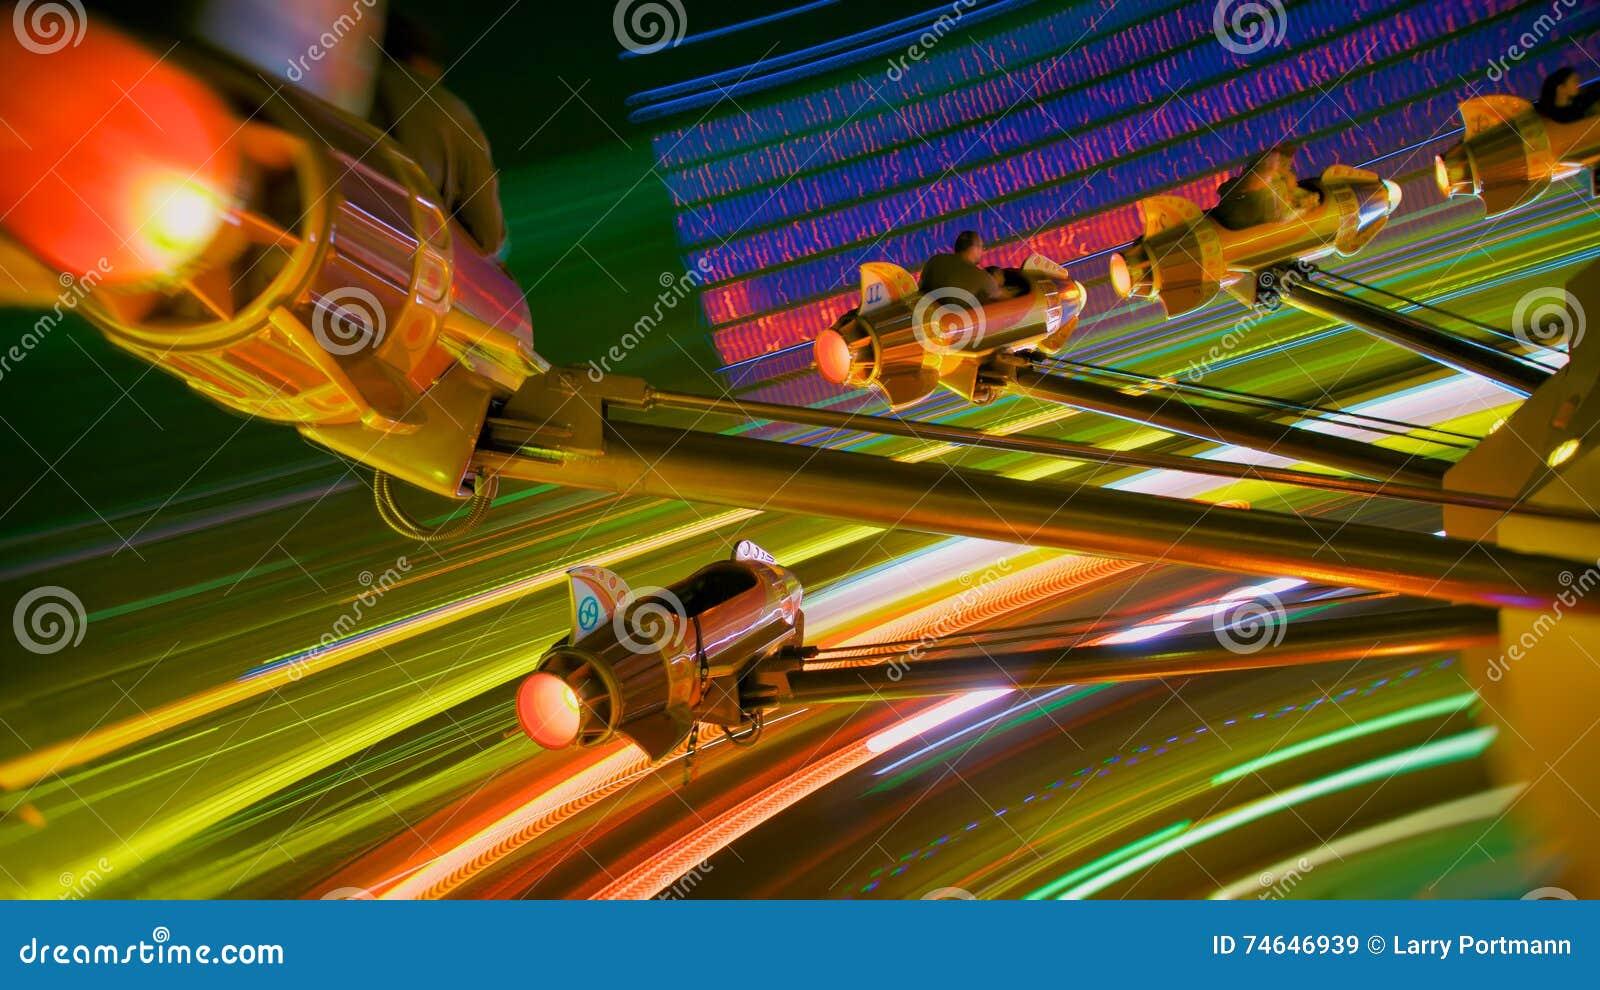 Amusement Park Rocket Ride at Night